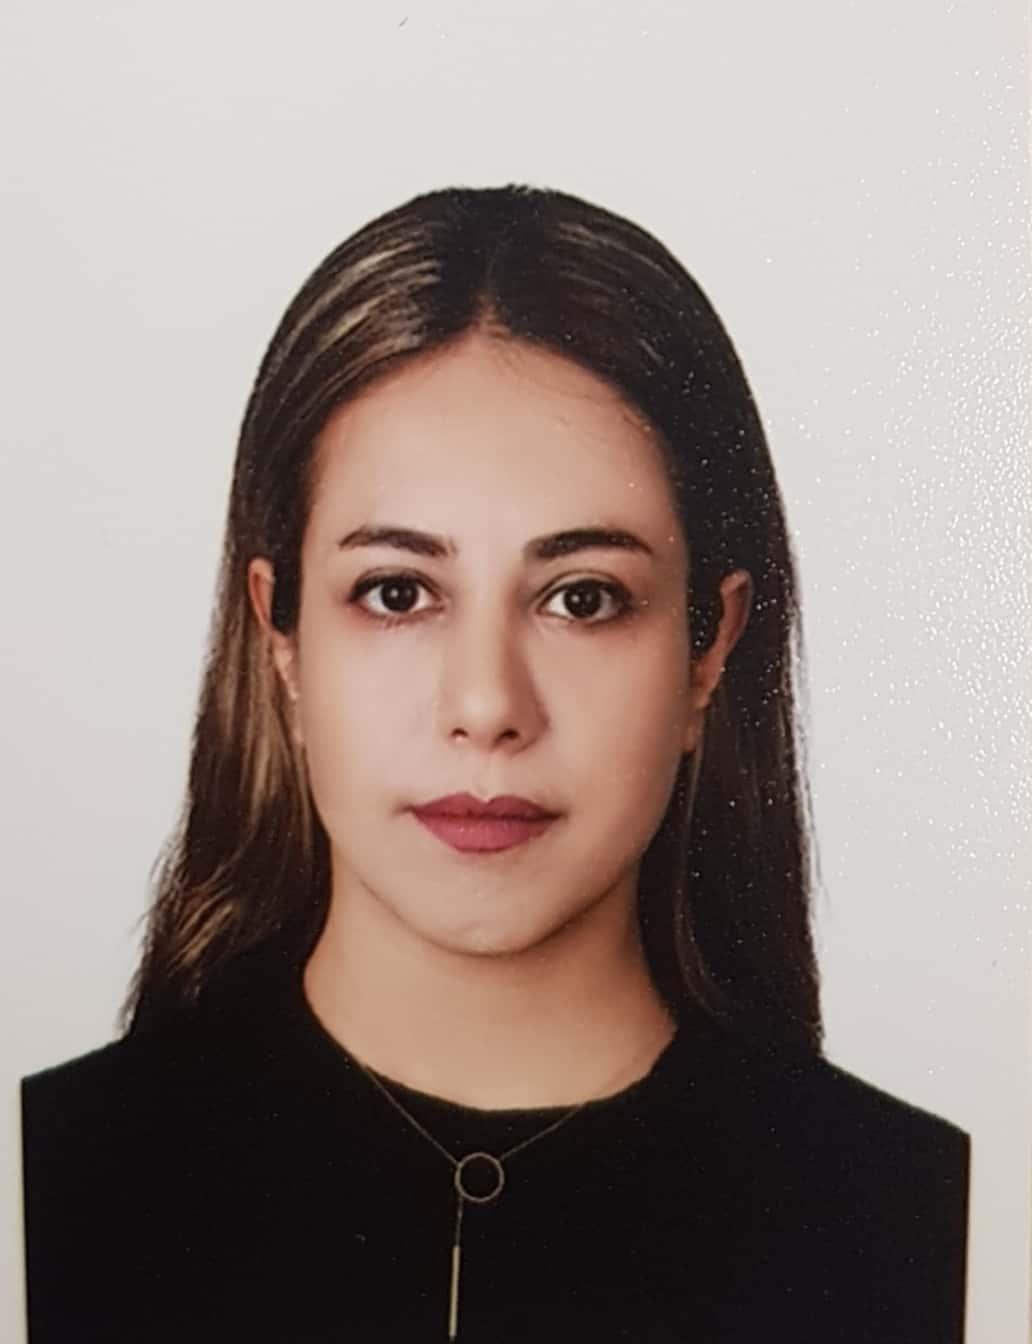 Simin Hesami